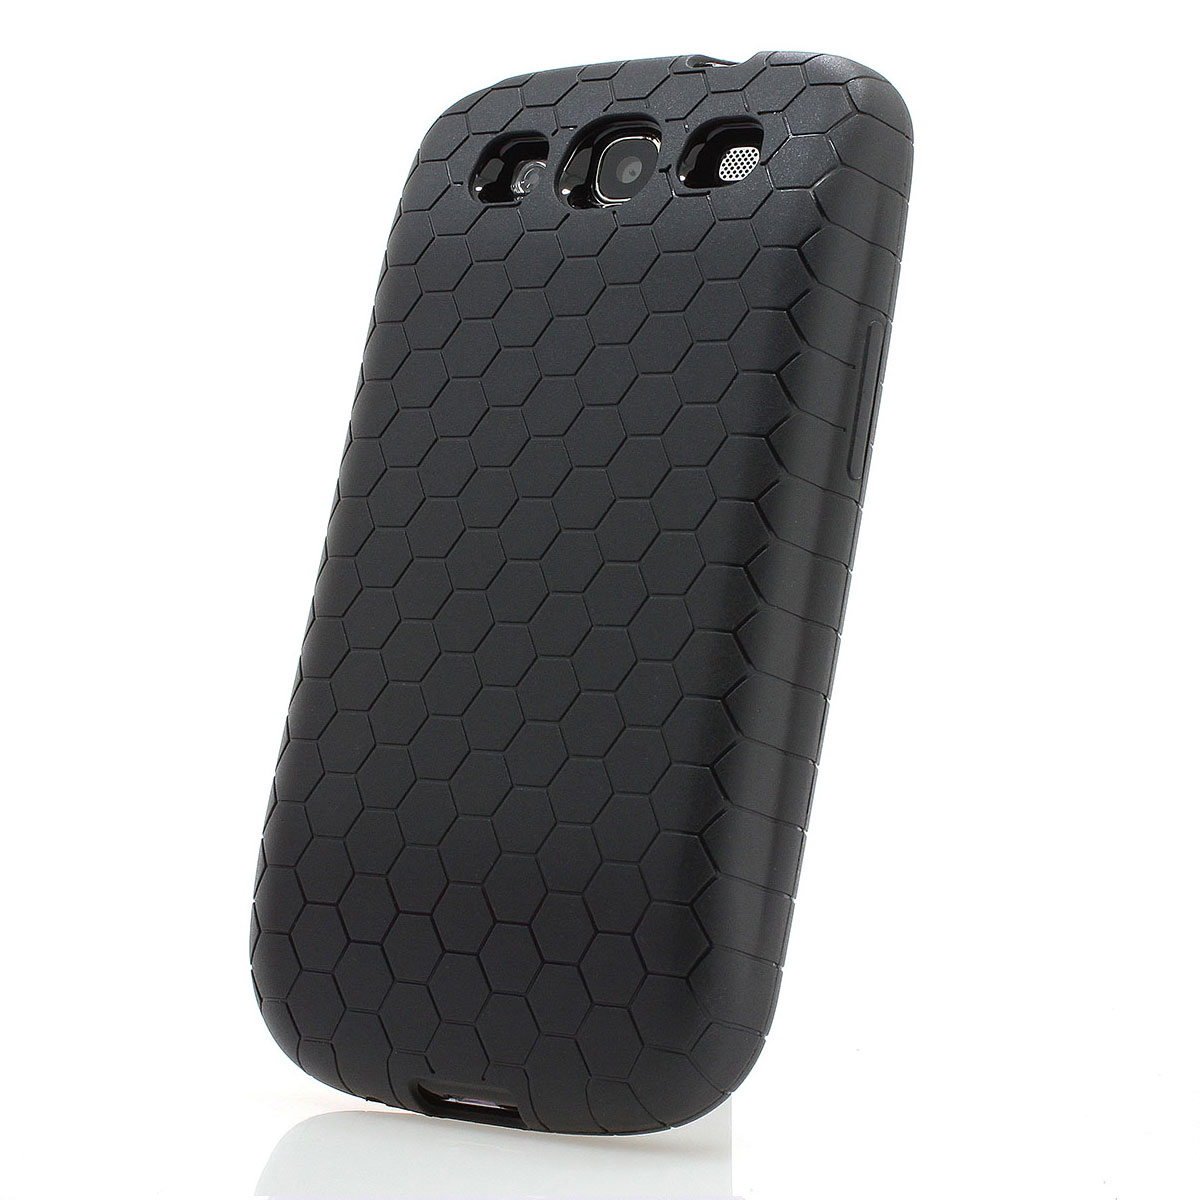 Samsung-Galaxy-S3-Case-Bumper-fuer-POWER-AKKU-4300mAh-schwarz